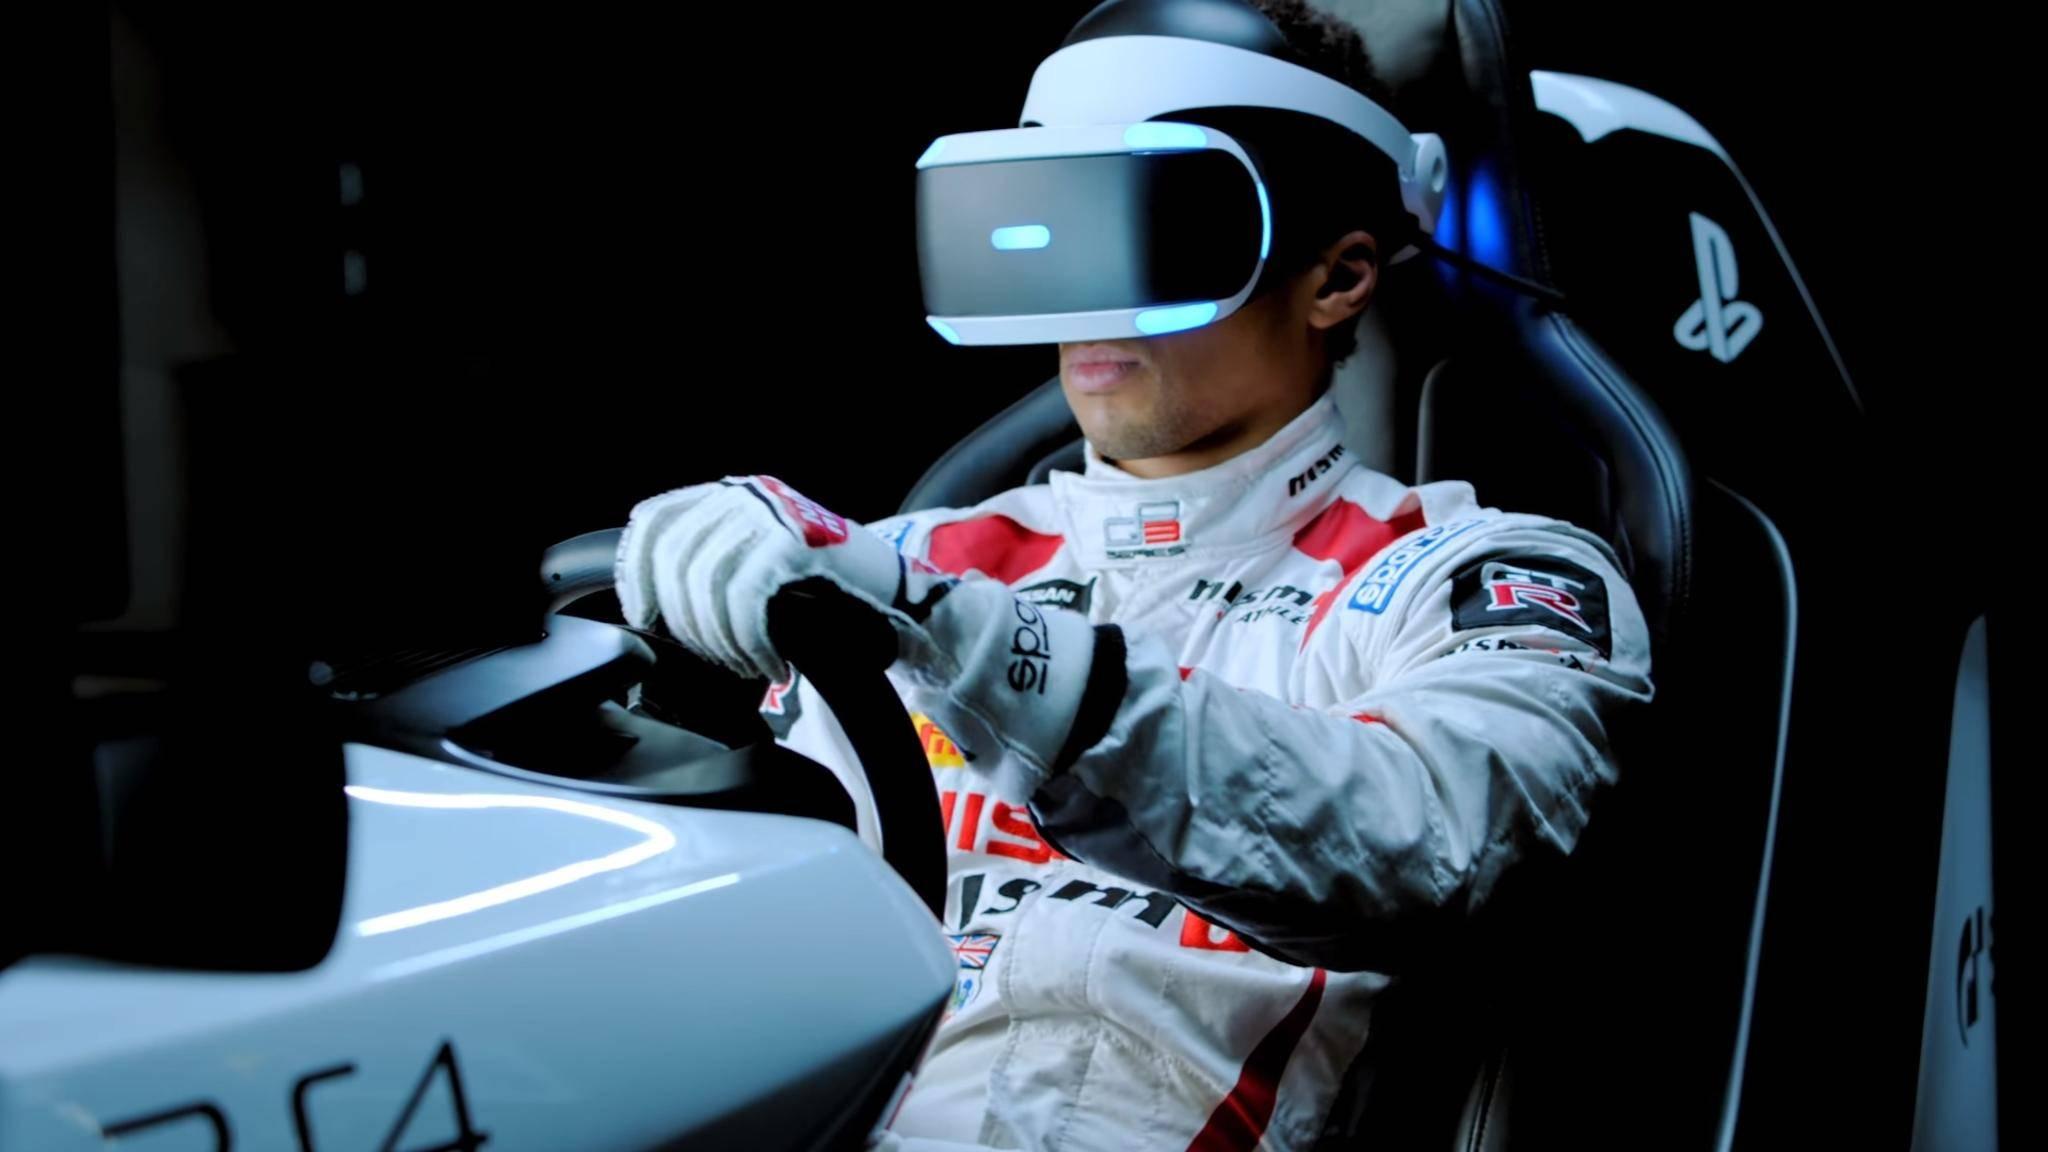 Virtual-Reality-Brillen wie PlayStation VR erobern die Gaming-Welt.